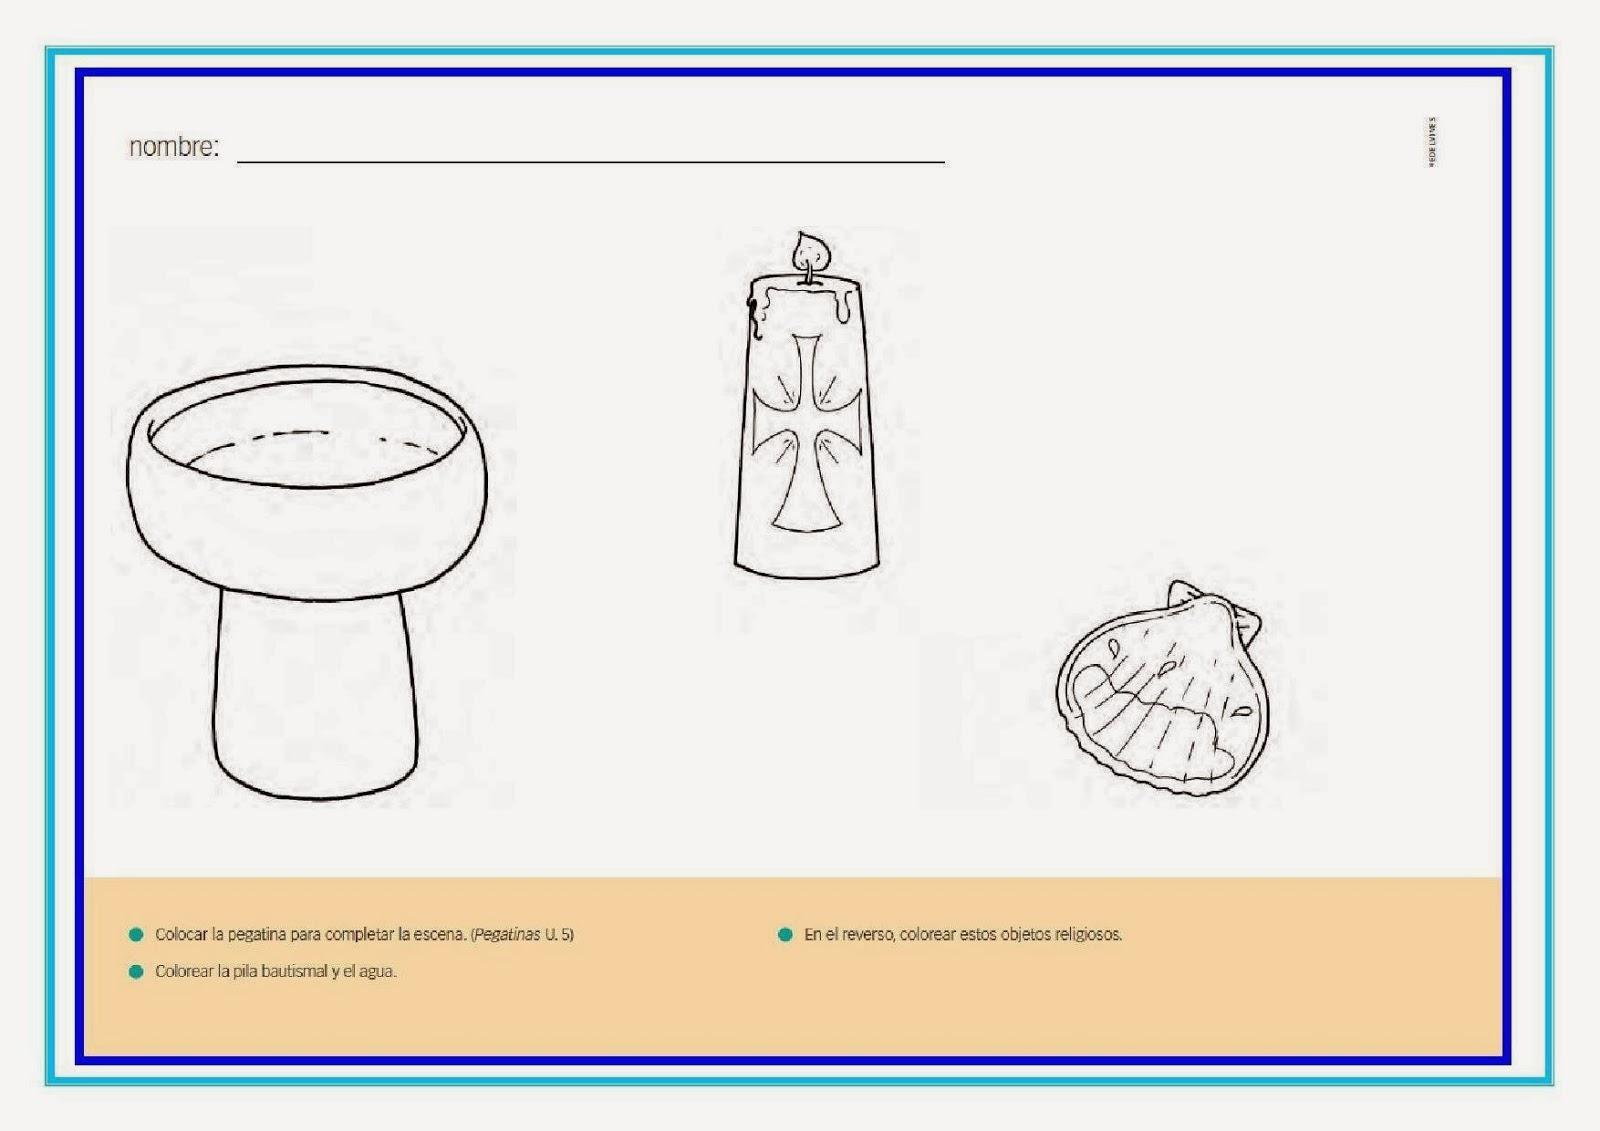 Dibujos de elementos de bautismo - Imagui